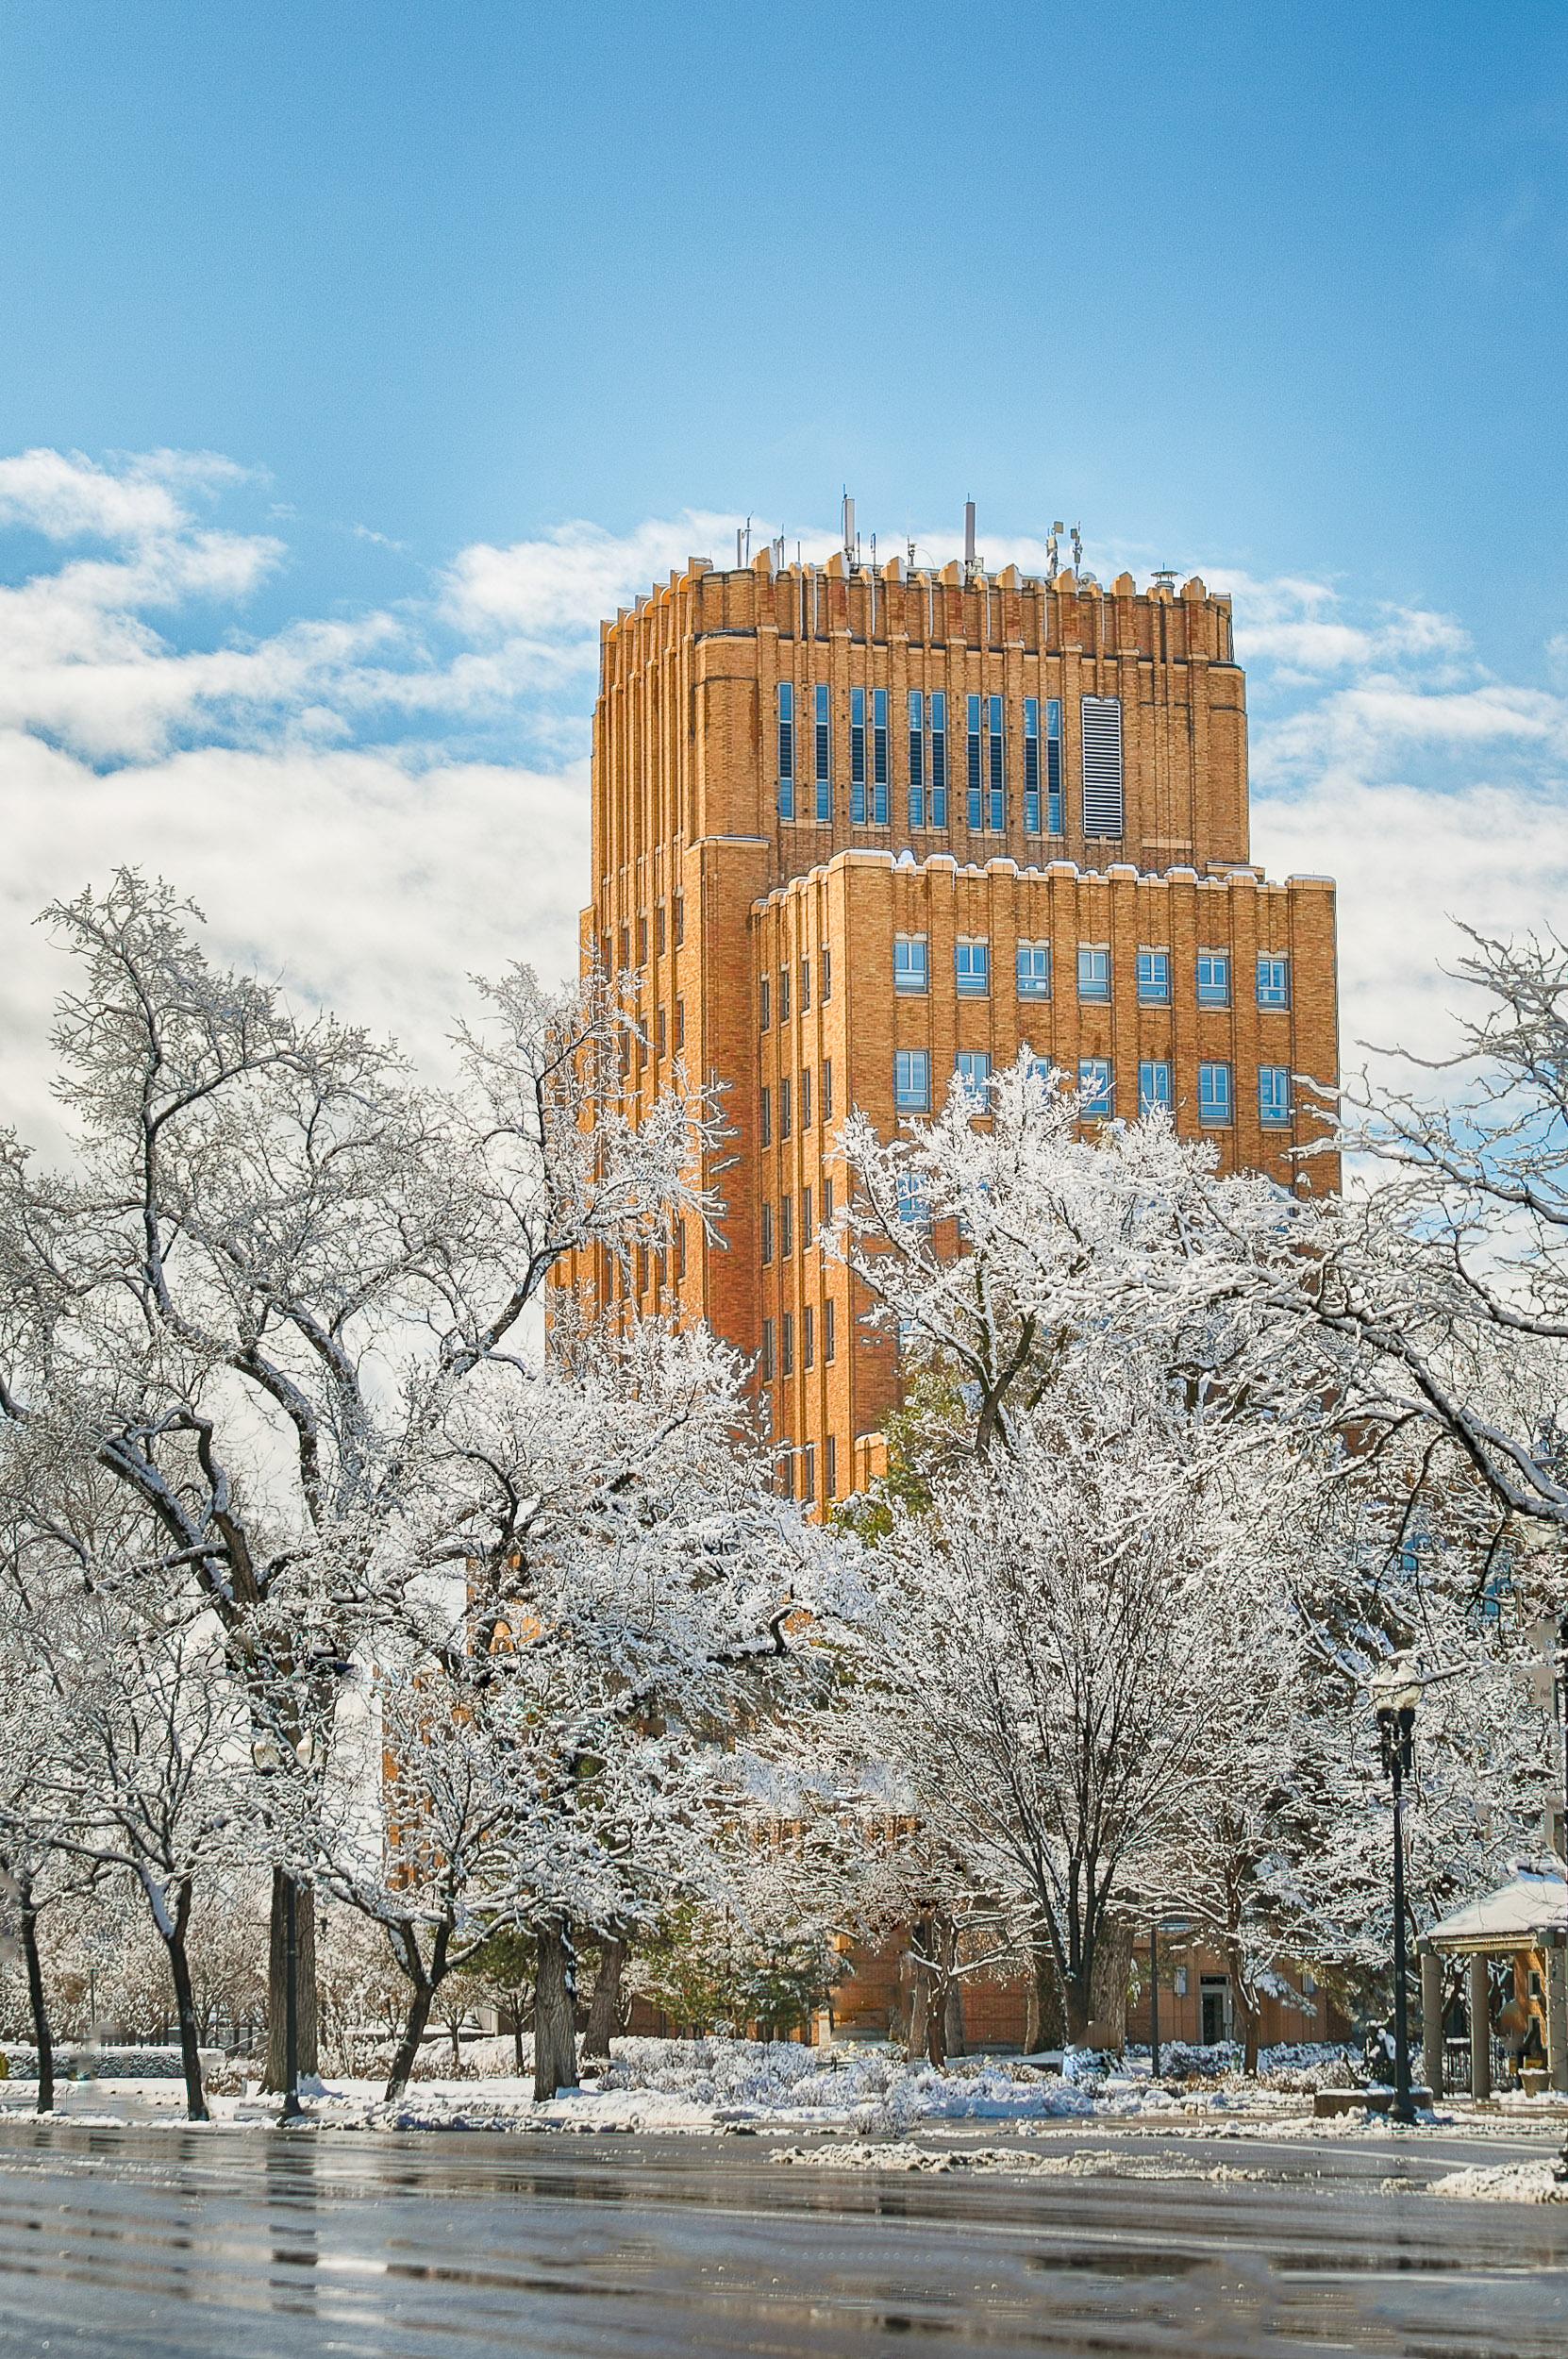 Municiple Building - Ogden City Hall -1.jpg